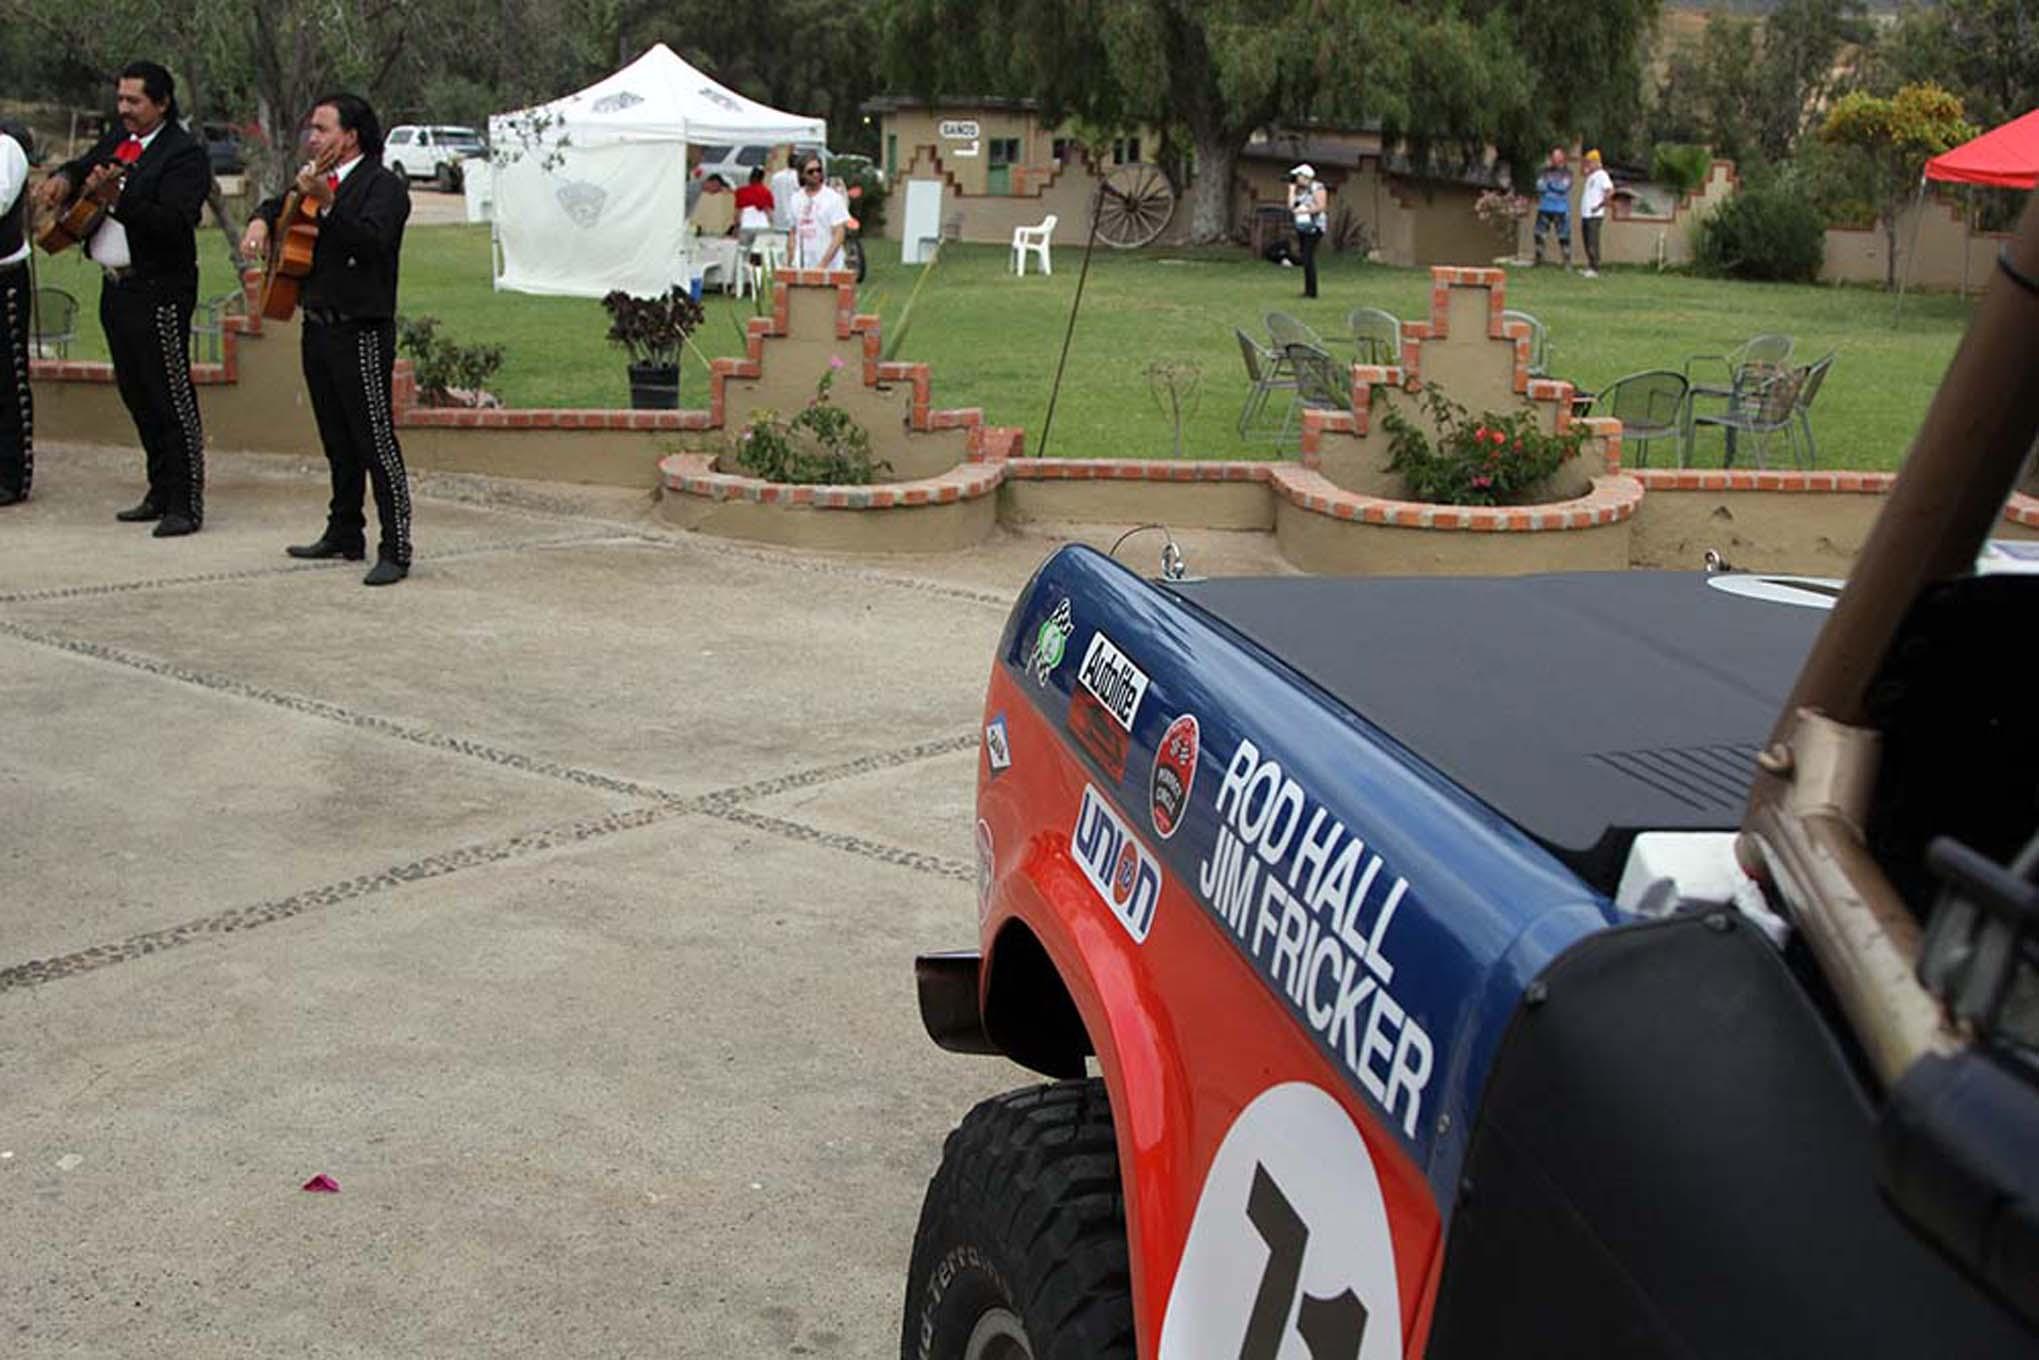 020NORRA Mexican 1000 BAJA offroad Race 2015 Manx Nova Chevy James Garner